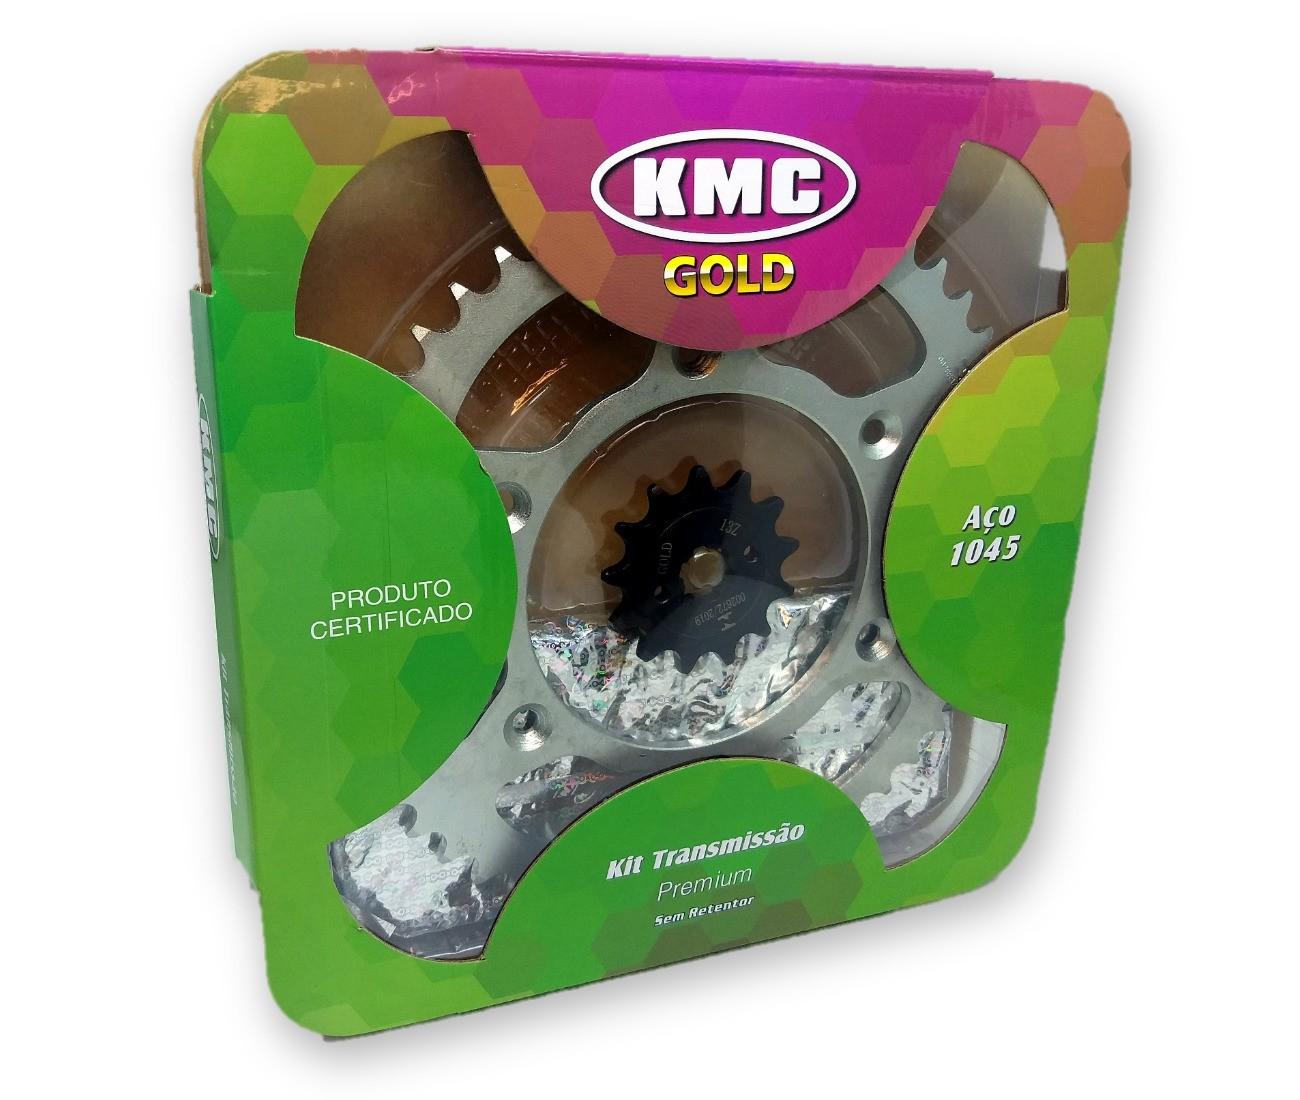 Kit Relação CRF 230 Aço 1045 KMC GOLD 520x110x50x13